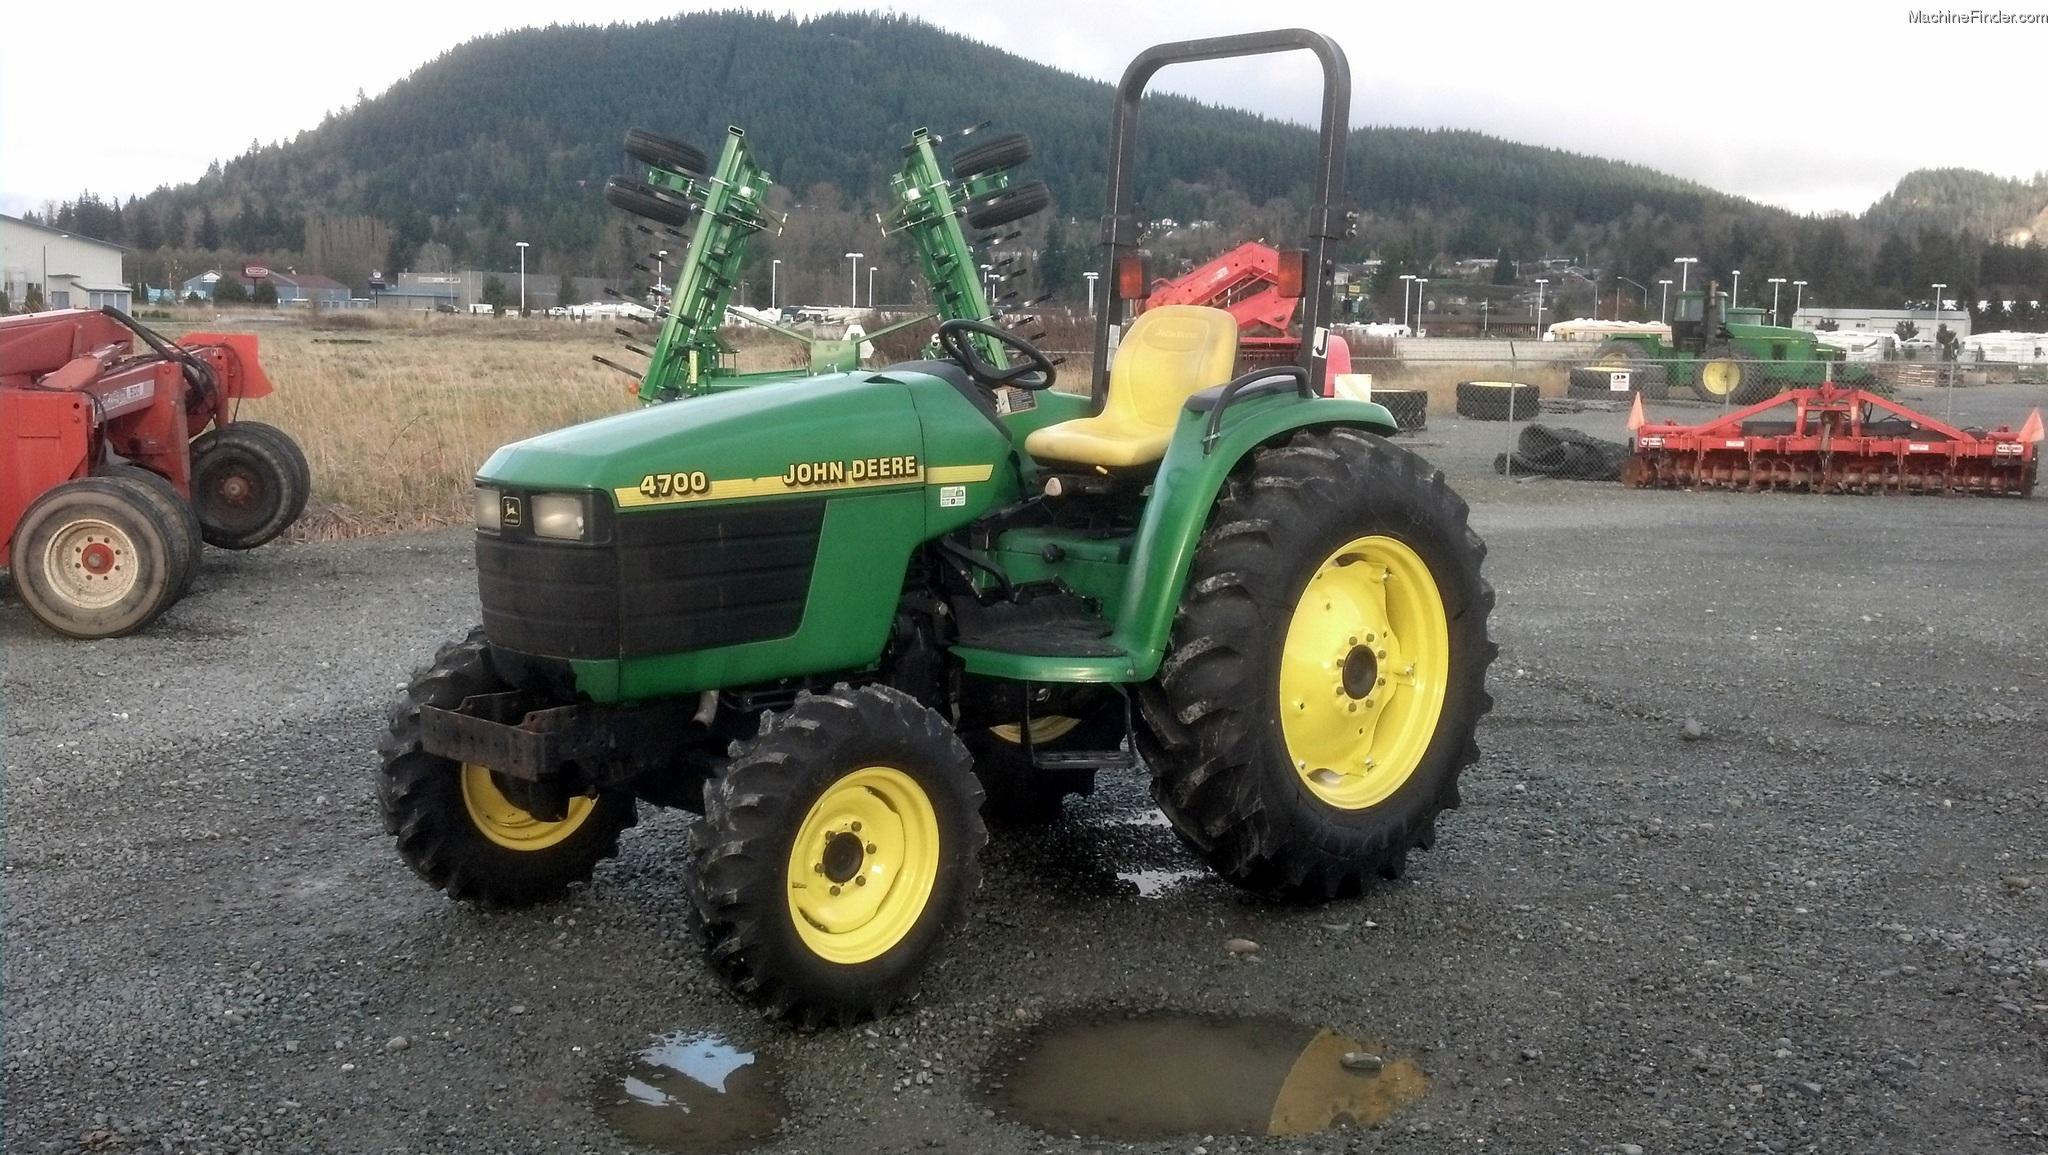 2002 John Deere 4700 Tractors - Compact (1-40hp.) - John ...